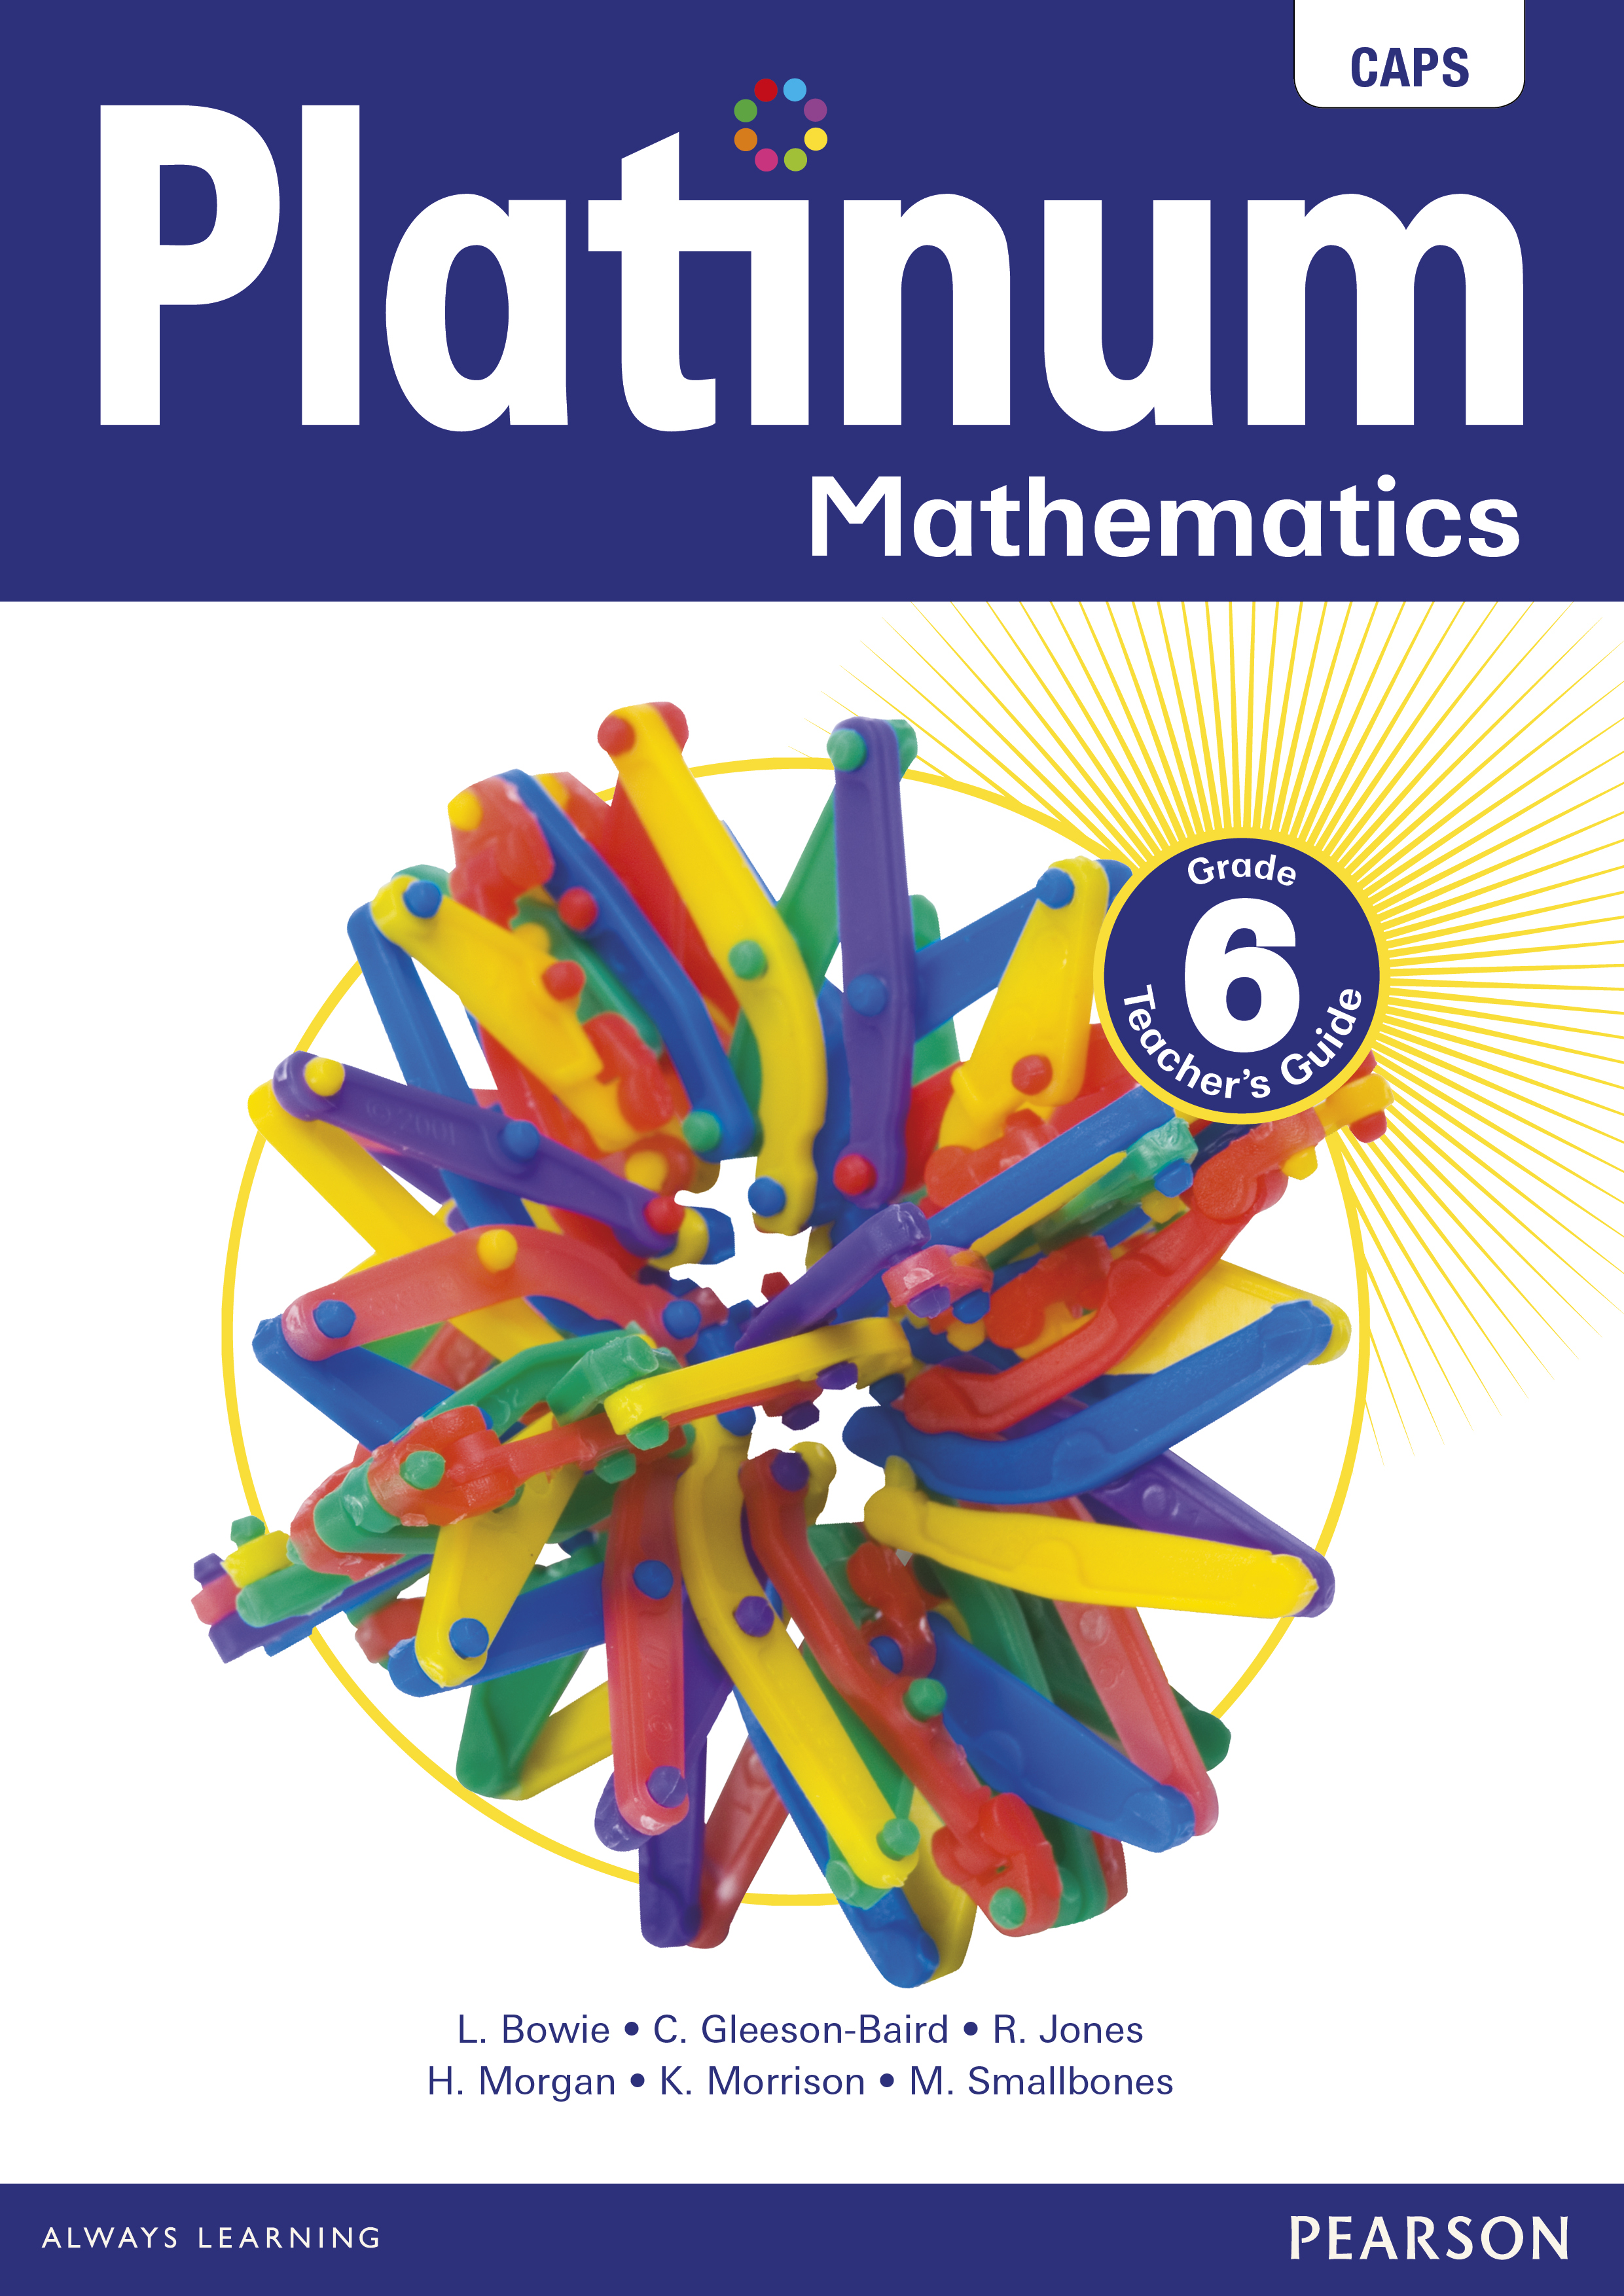 platinum mathematics grade 6 teacher s guide epdf perpetual licence rh wcedeportal co za